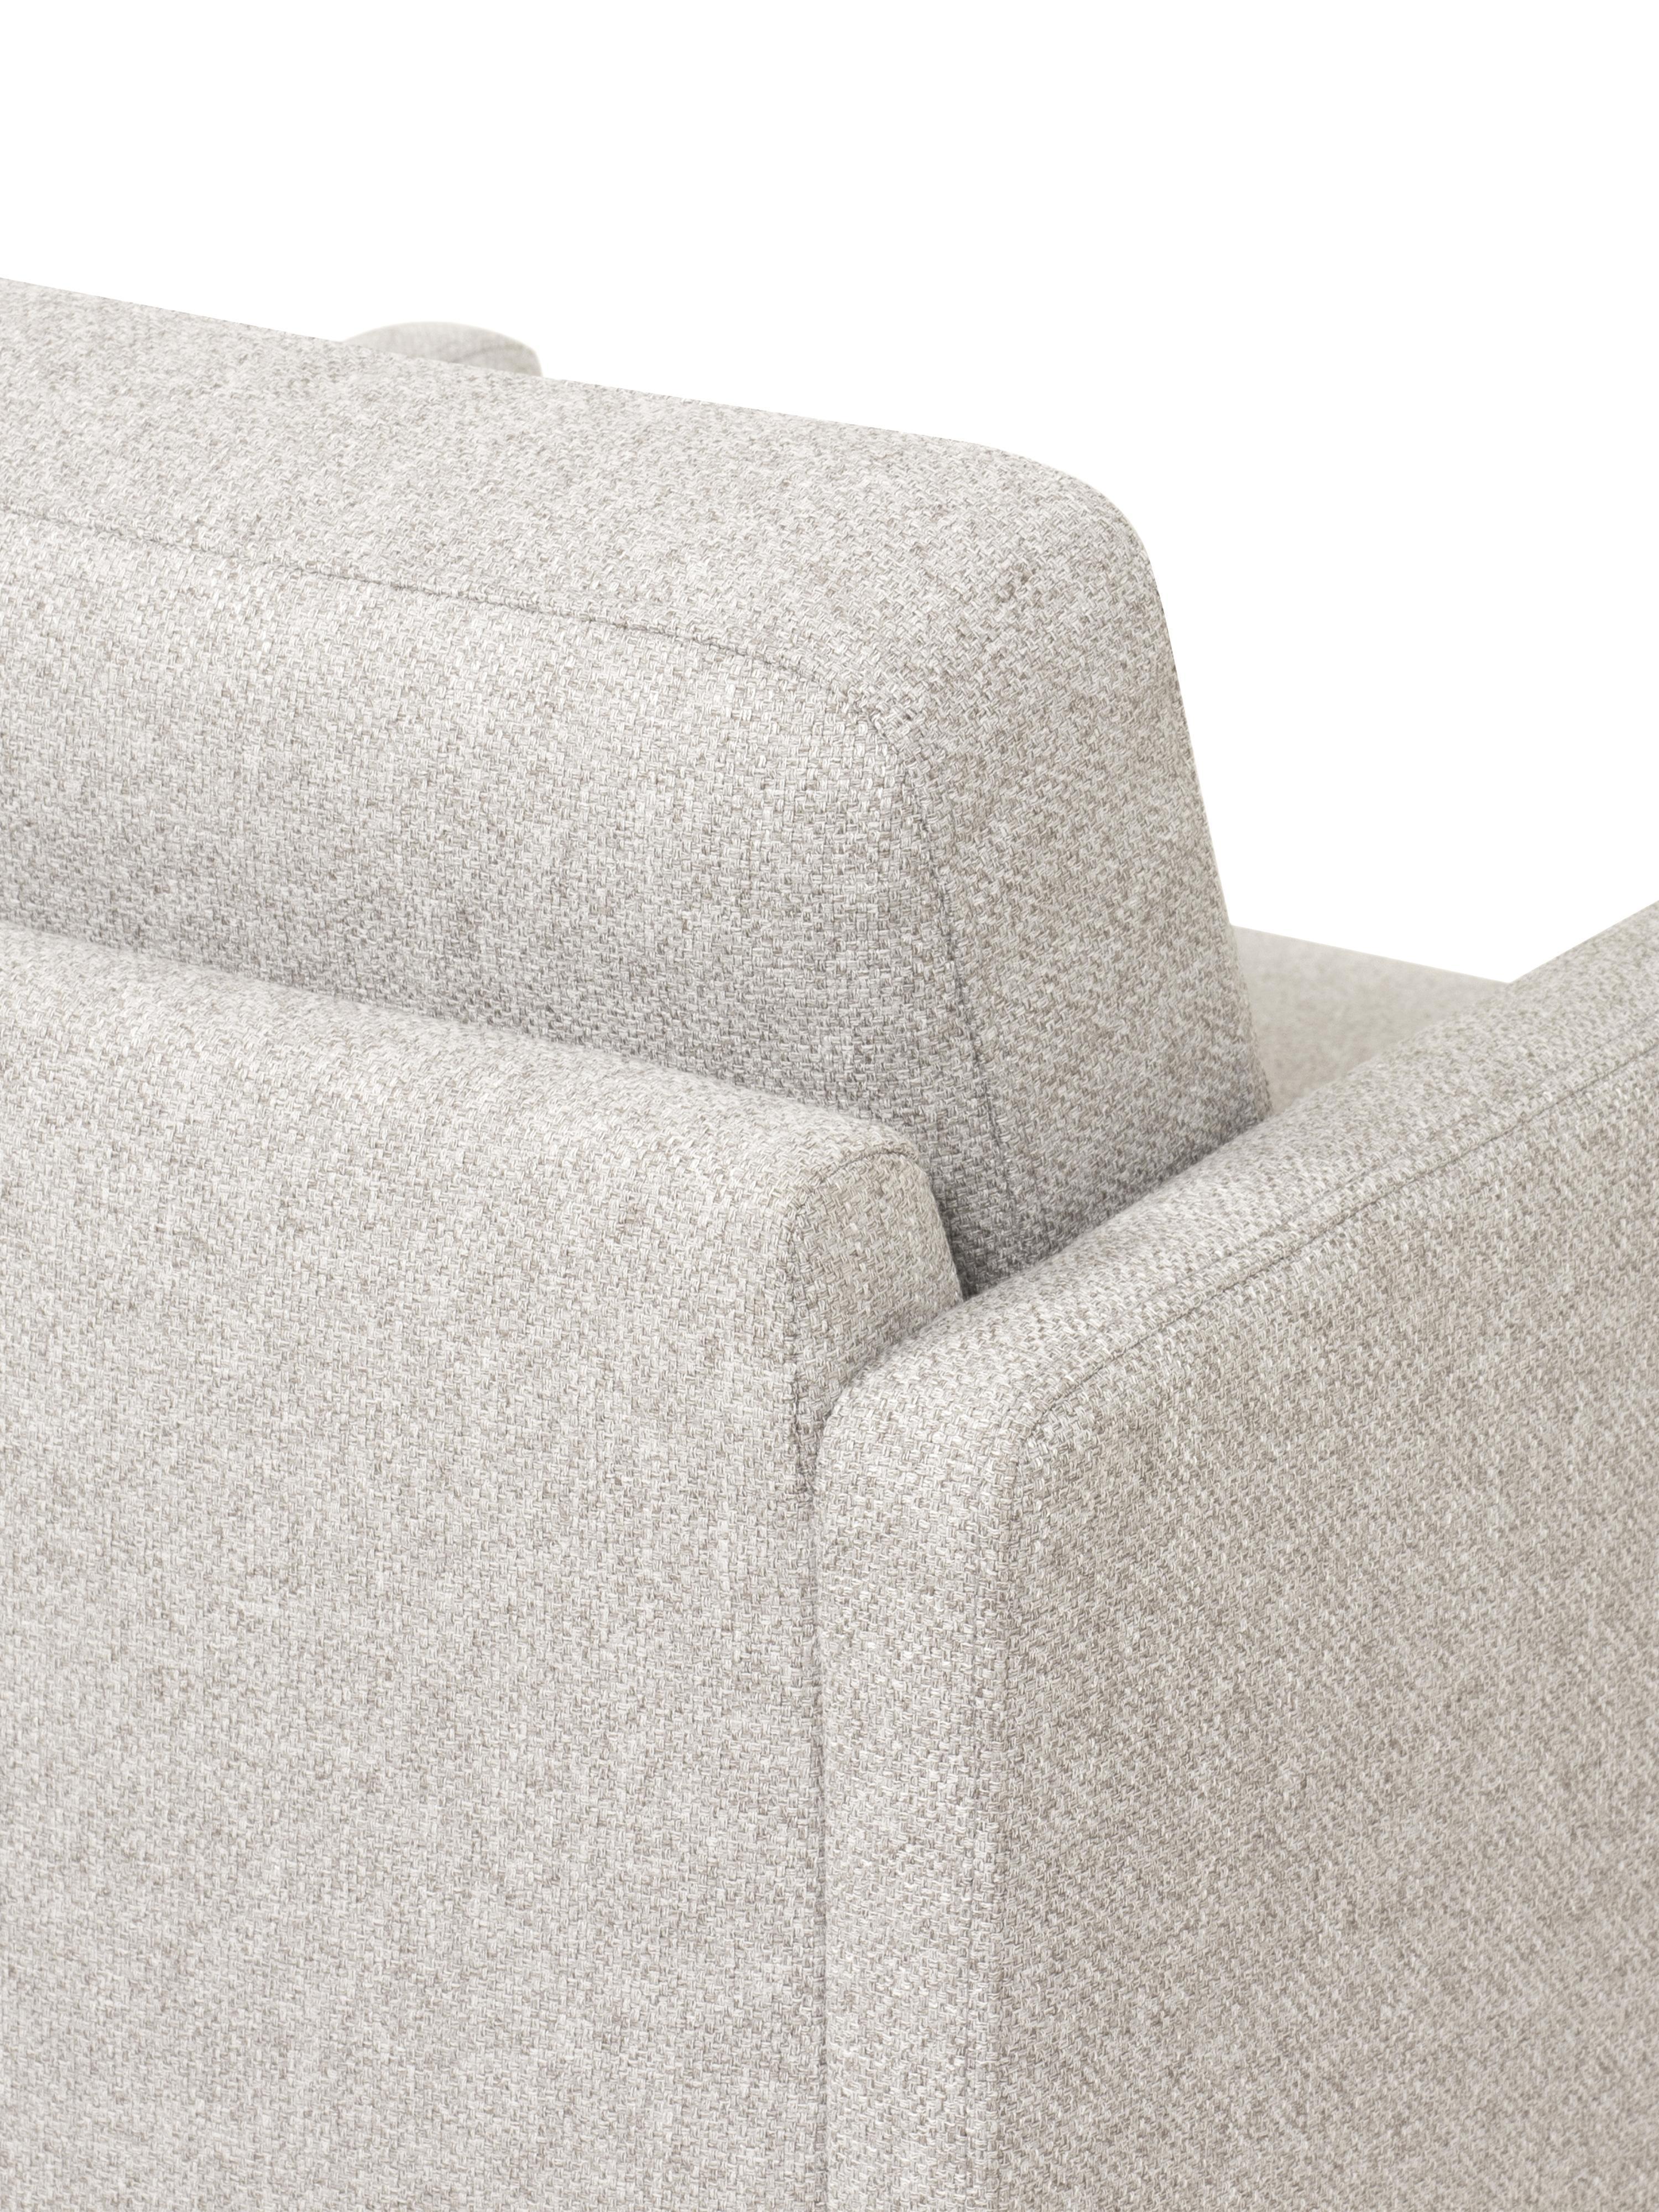 Sessel Fluente, Bezug: 80% Polyester, 20% Ramie , Gestell: Massives Kiefernholz, Füße: Metall, pulverbeschichtet, Webstoff Beige, B 74 x T 85 cm